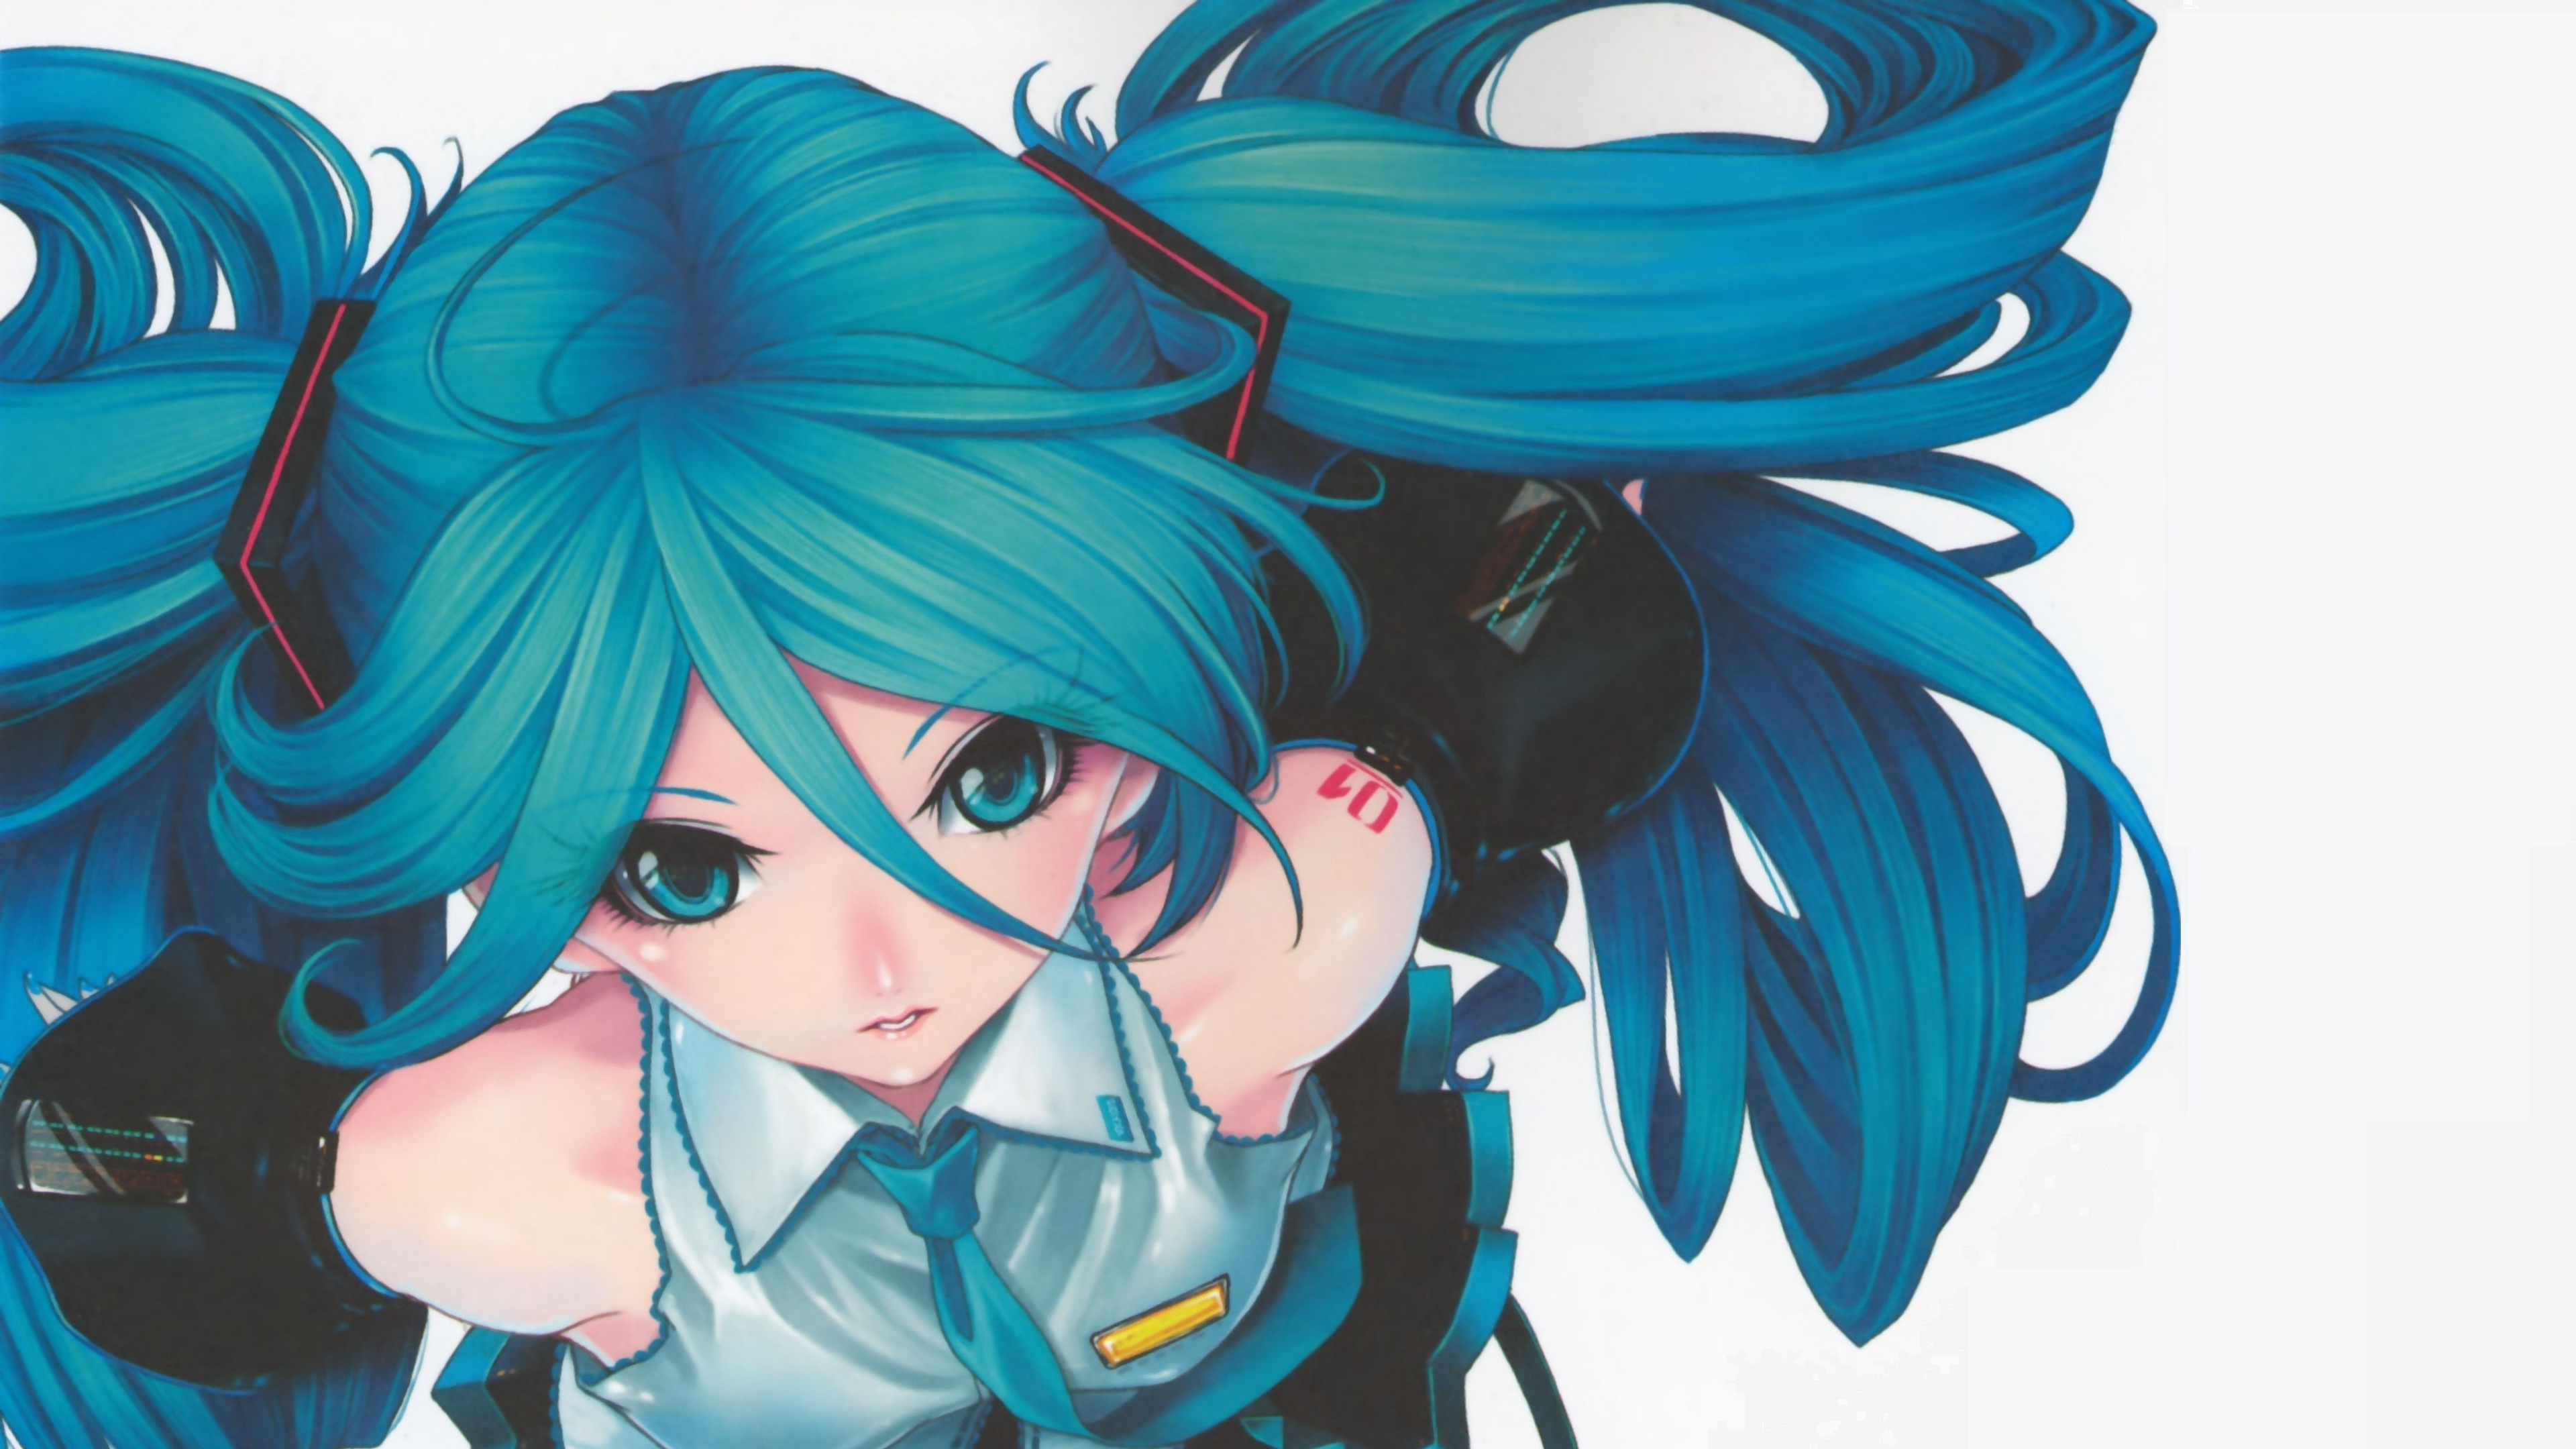 vocaloid miku hatsune girl hair 4k 1541975759 - vocaloid, miku hatsune, girl, hair 4k - Vocaloid, miku hatsune, Girl